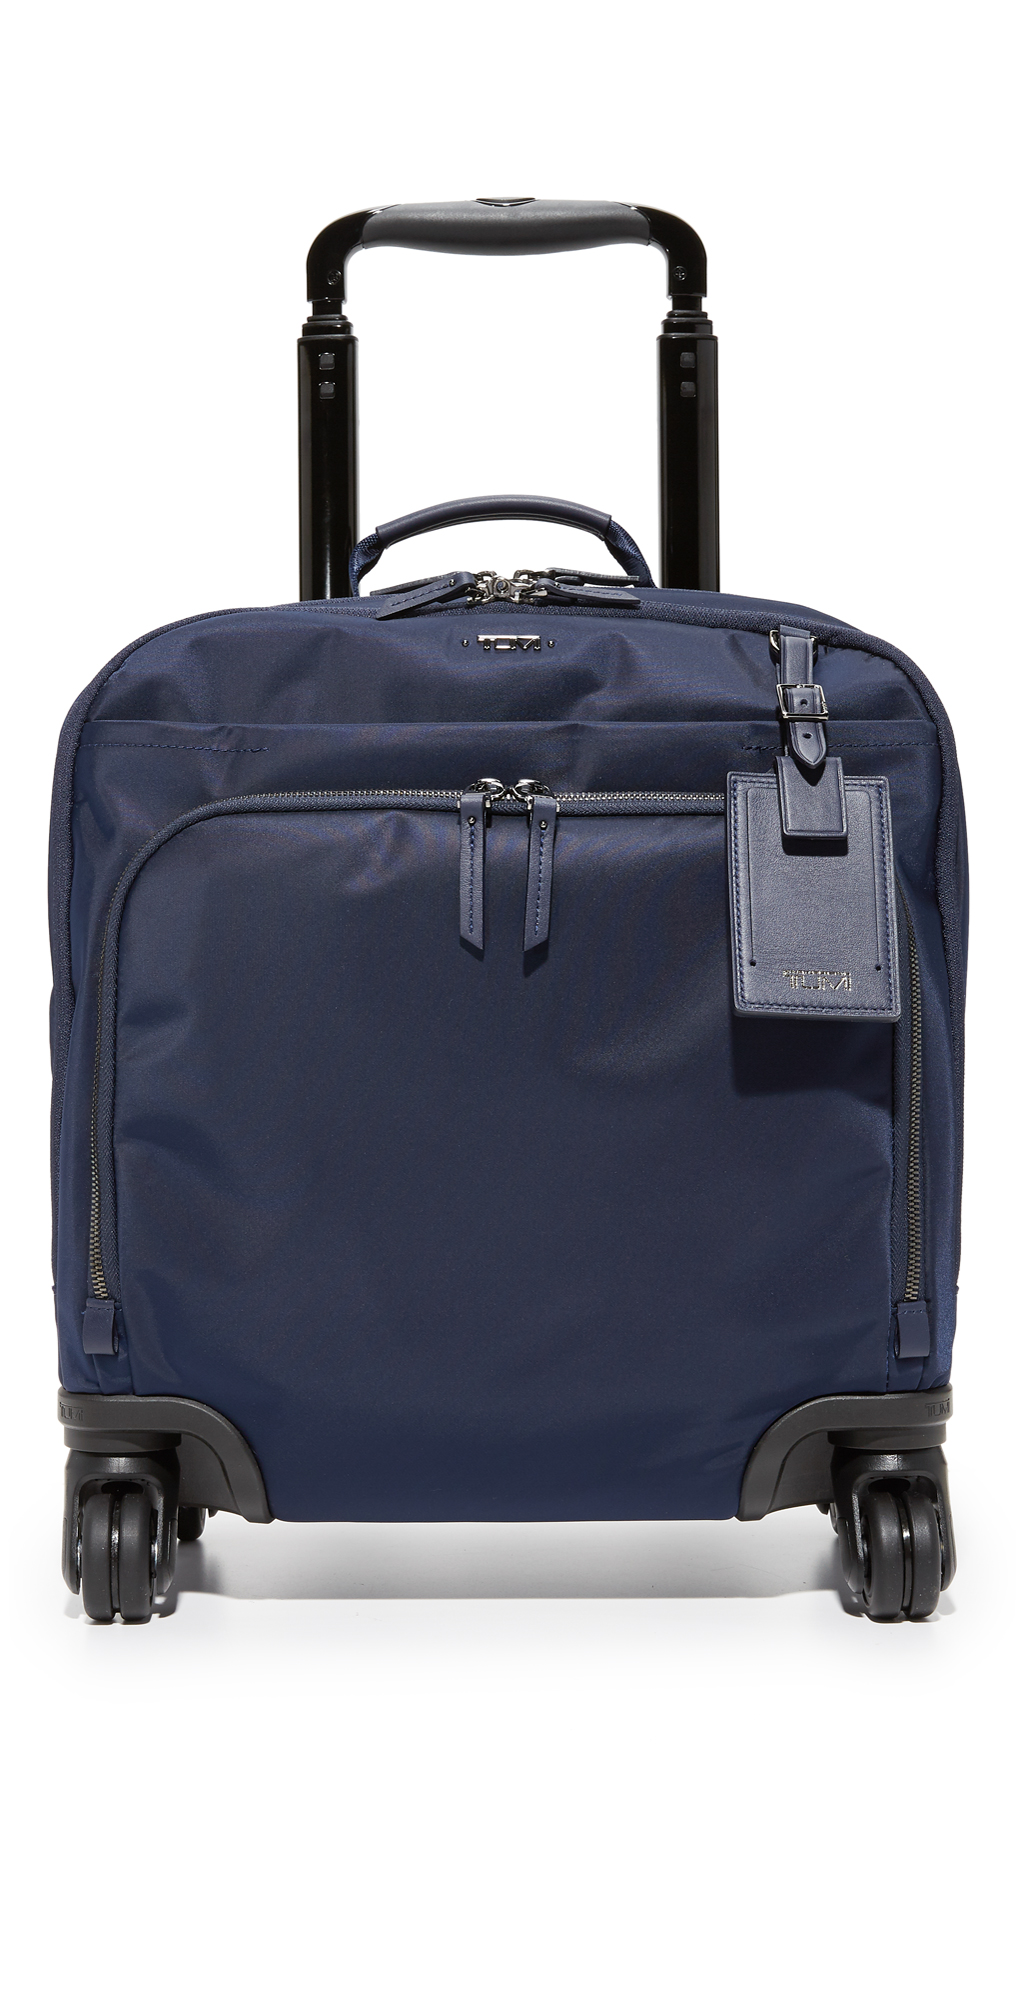 Oslo 4 Wheel Compact Carry On Luggage Tumi